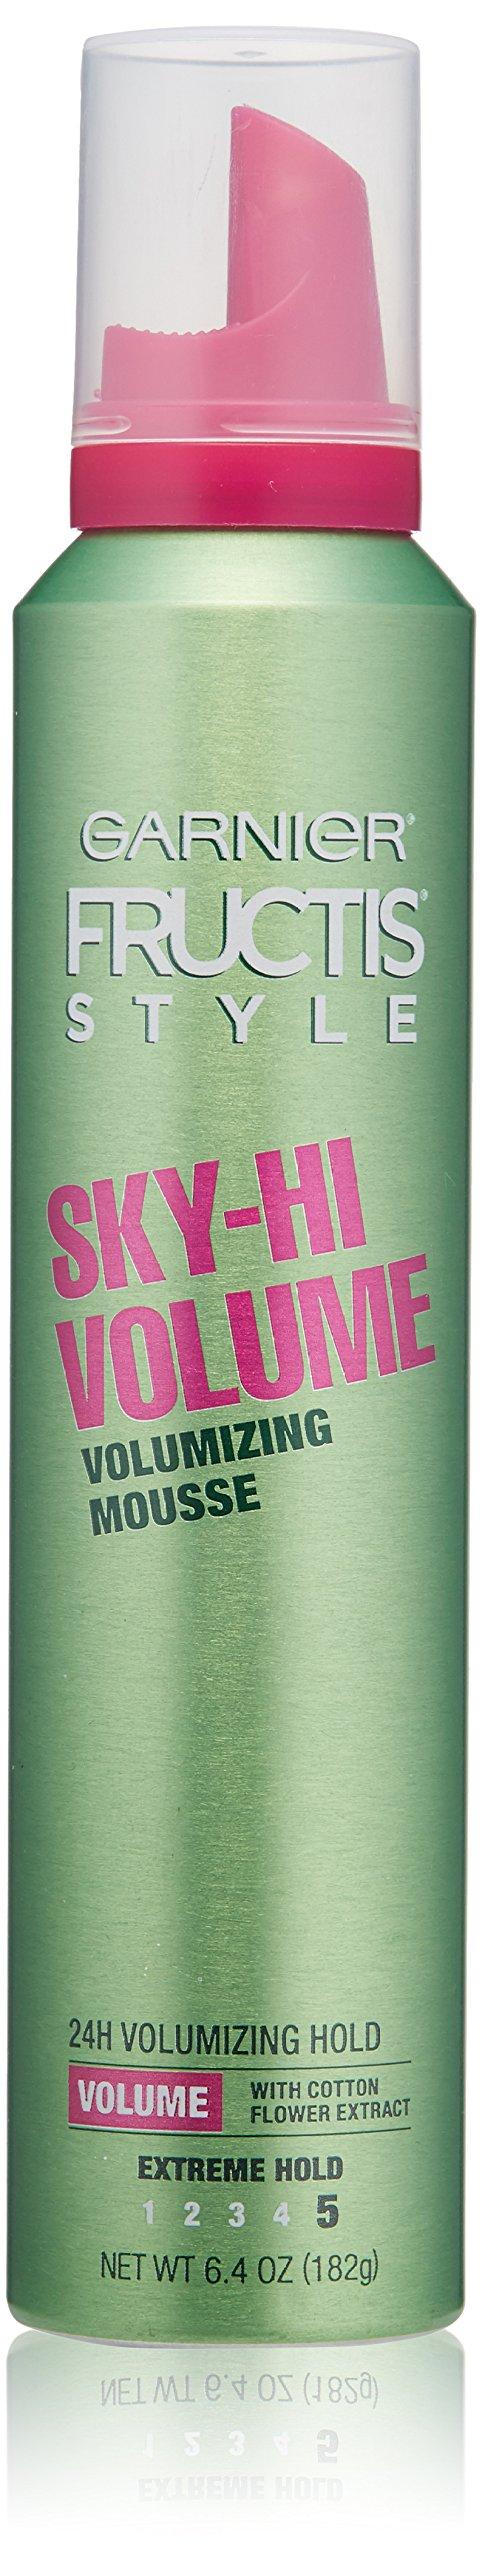 Garnier Fructis Style Sky-Hi Volume Mousse, Extreme Hold 6.40 oz